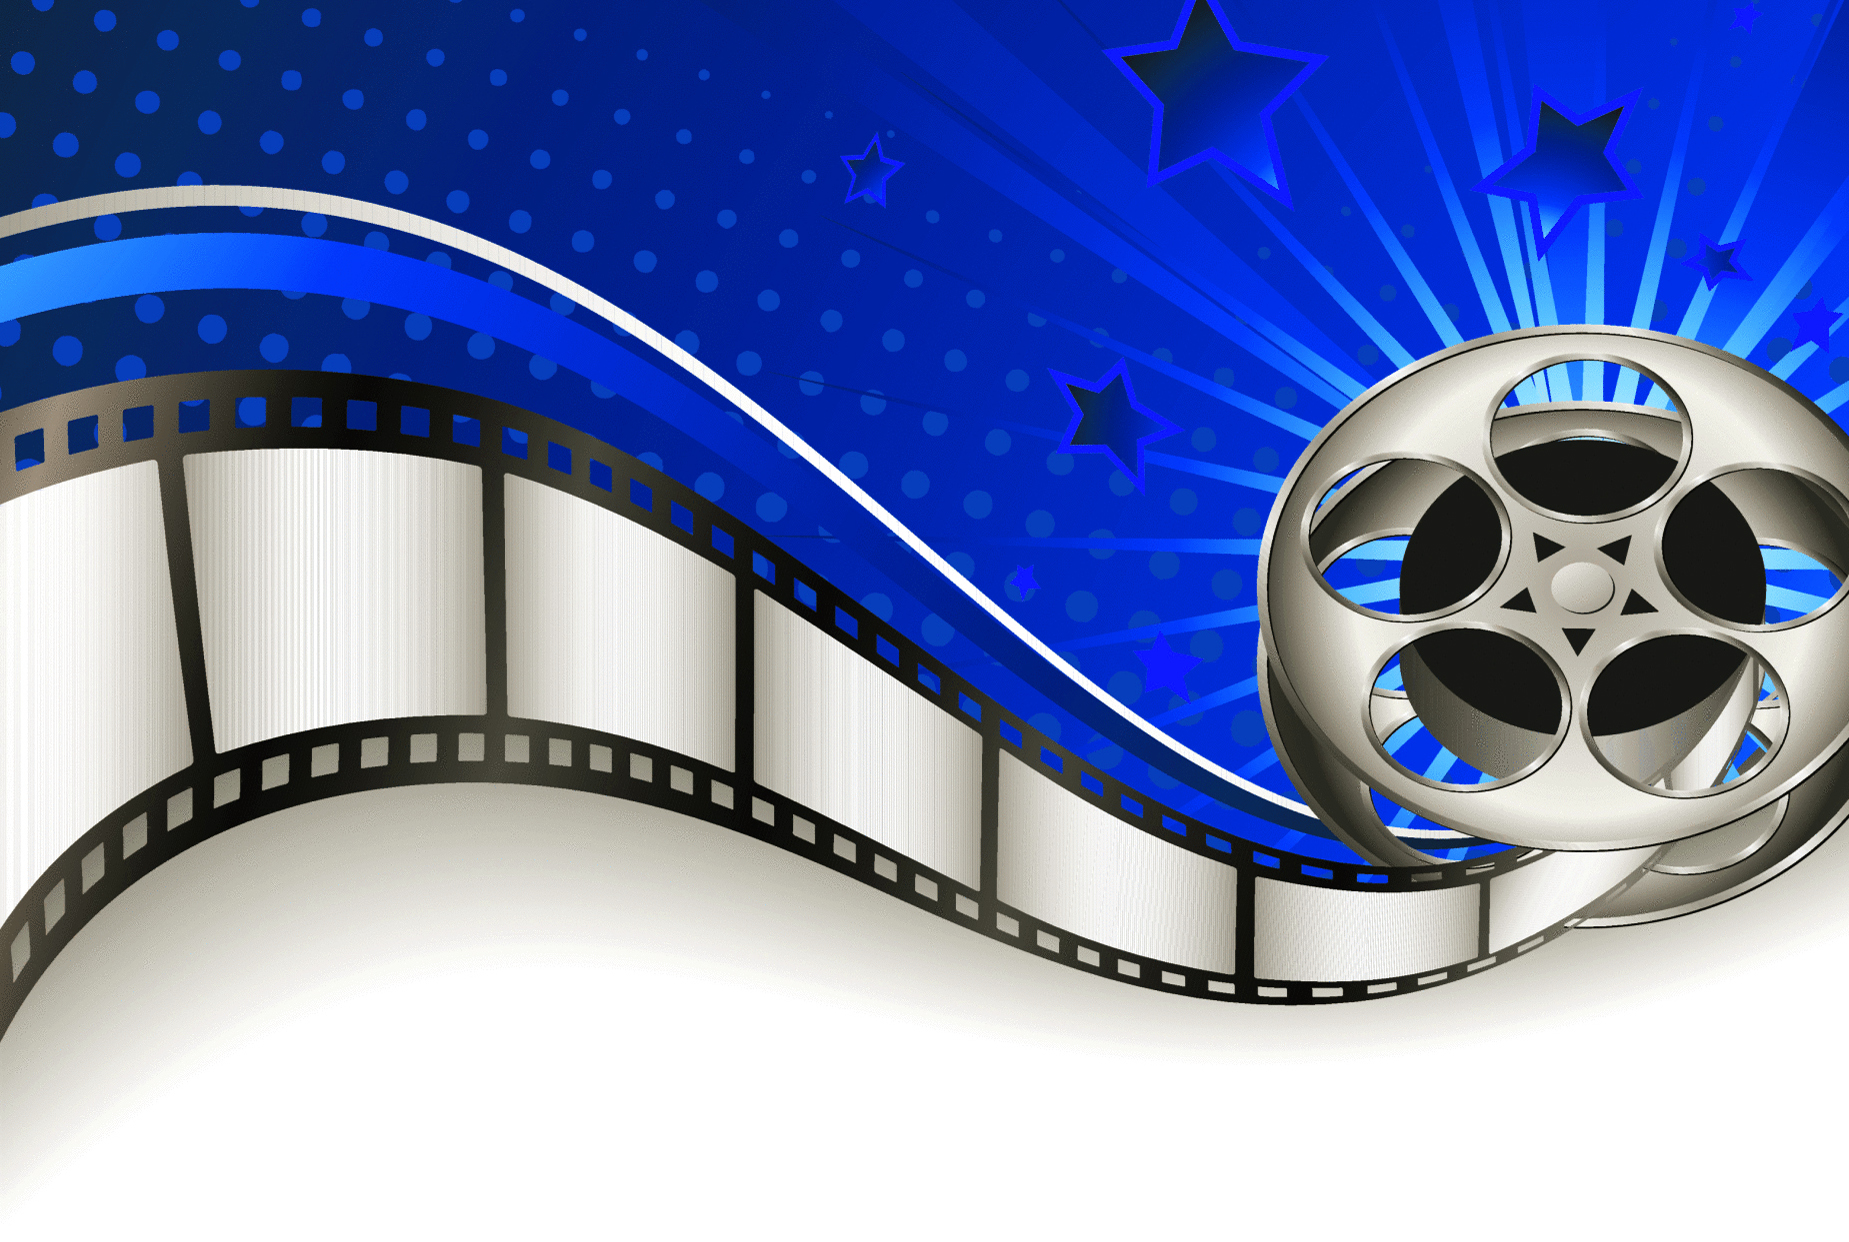 Скачать видео бэкграунд кино фото тематики 8